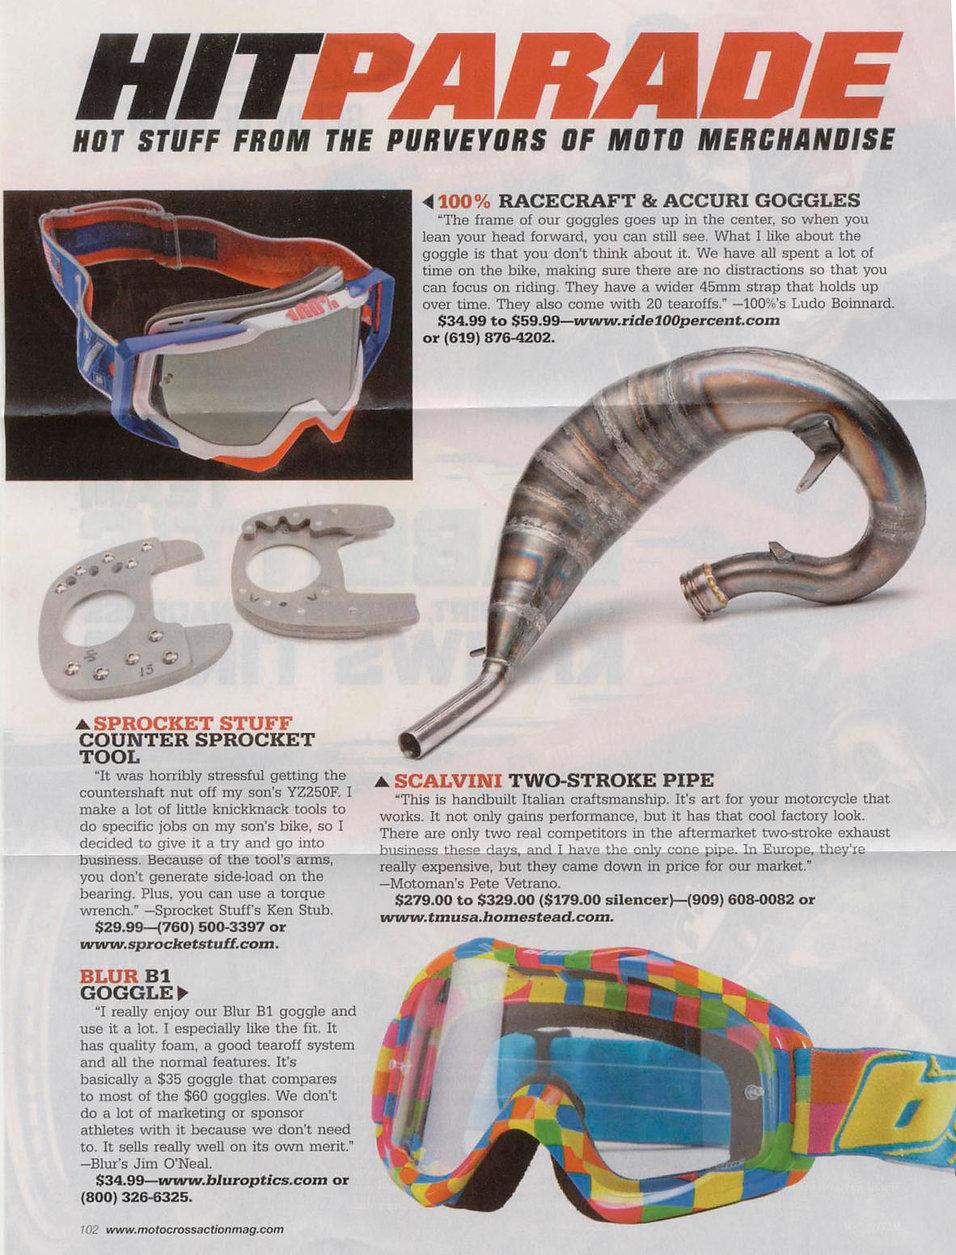 Scalvini 2-Stroke Pipes MXA Magazine Test April 2013